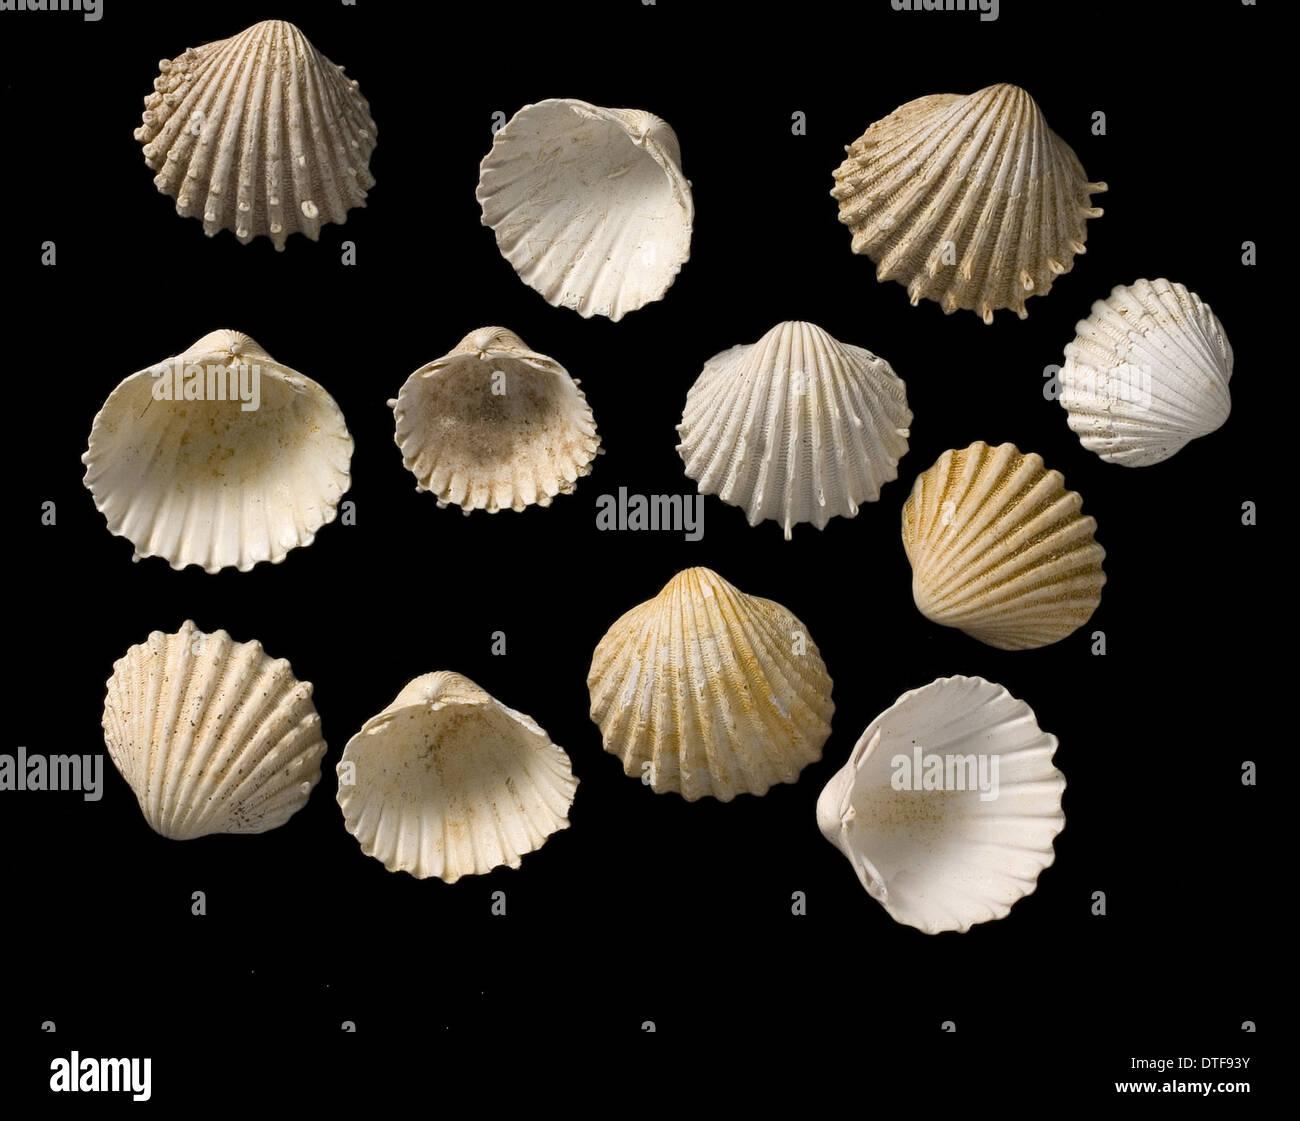 Shells from the genus Cardium - Stock Image